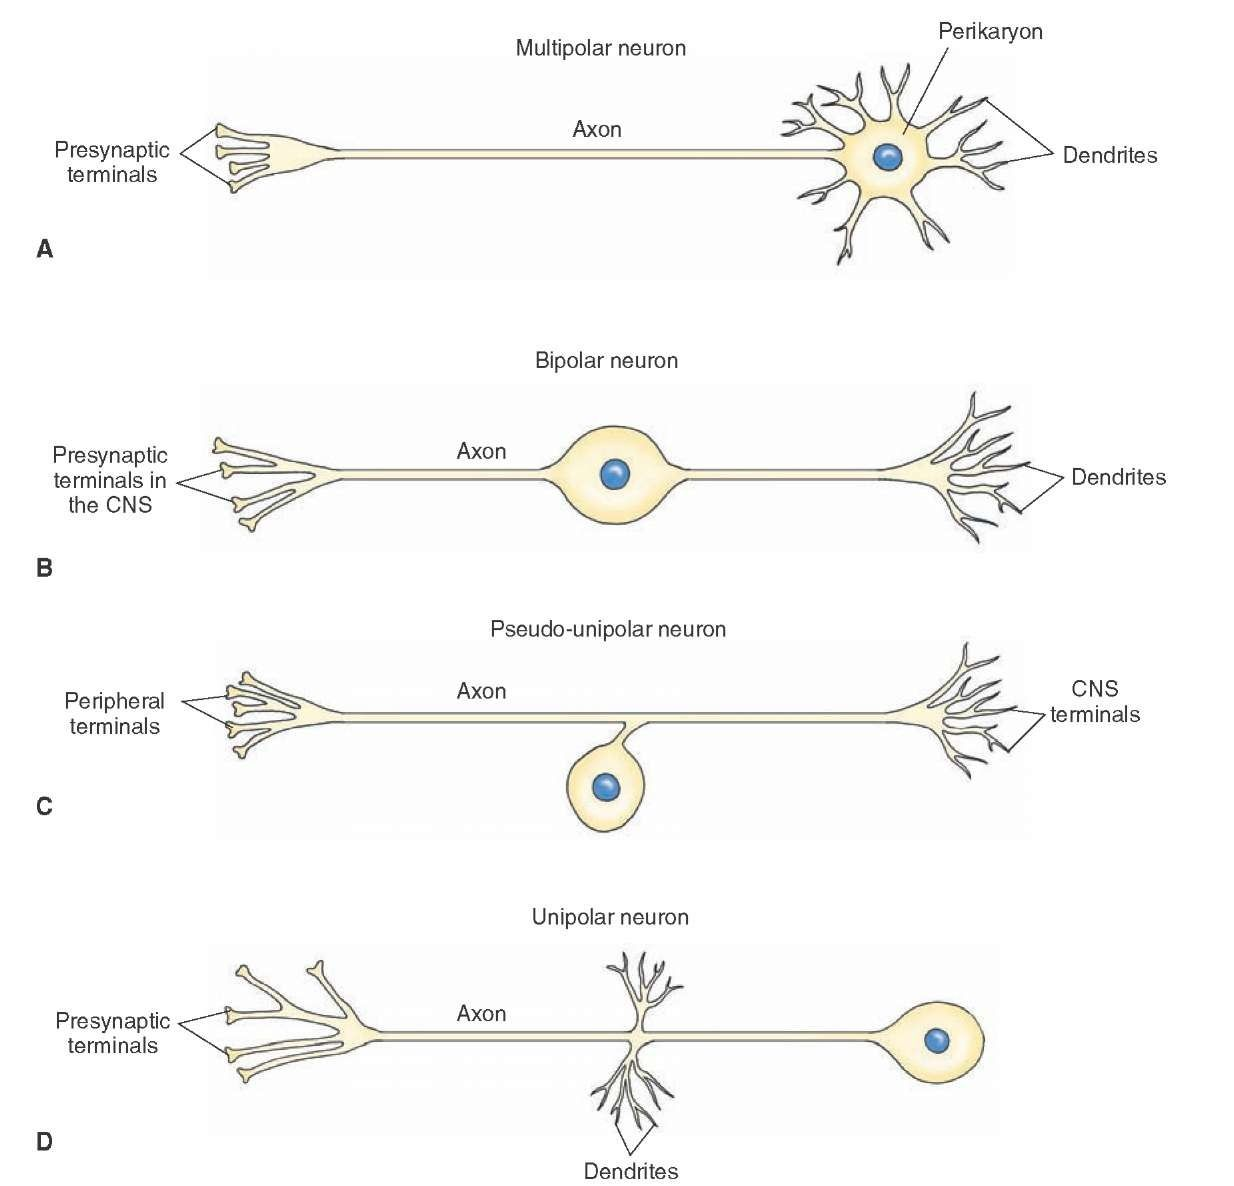 different types of neurons a multipolar neuron b bipolar neuron c pseudo unipolar neuron d unipolar neuron cns central nervous system  [ 1234 x 1186 Pixel ]